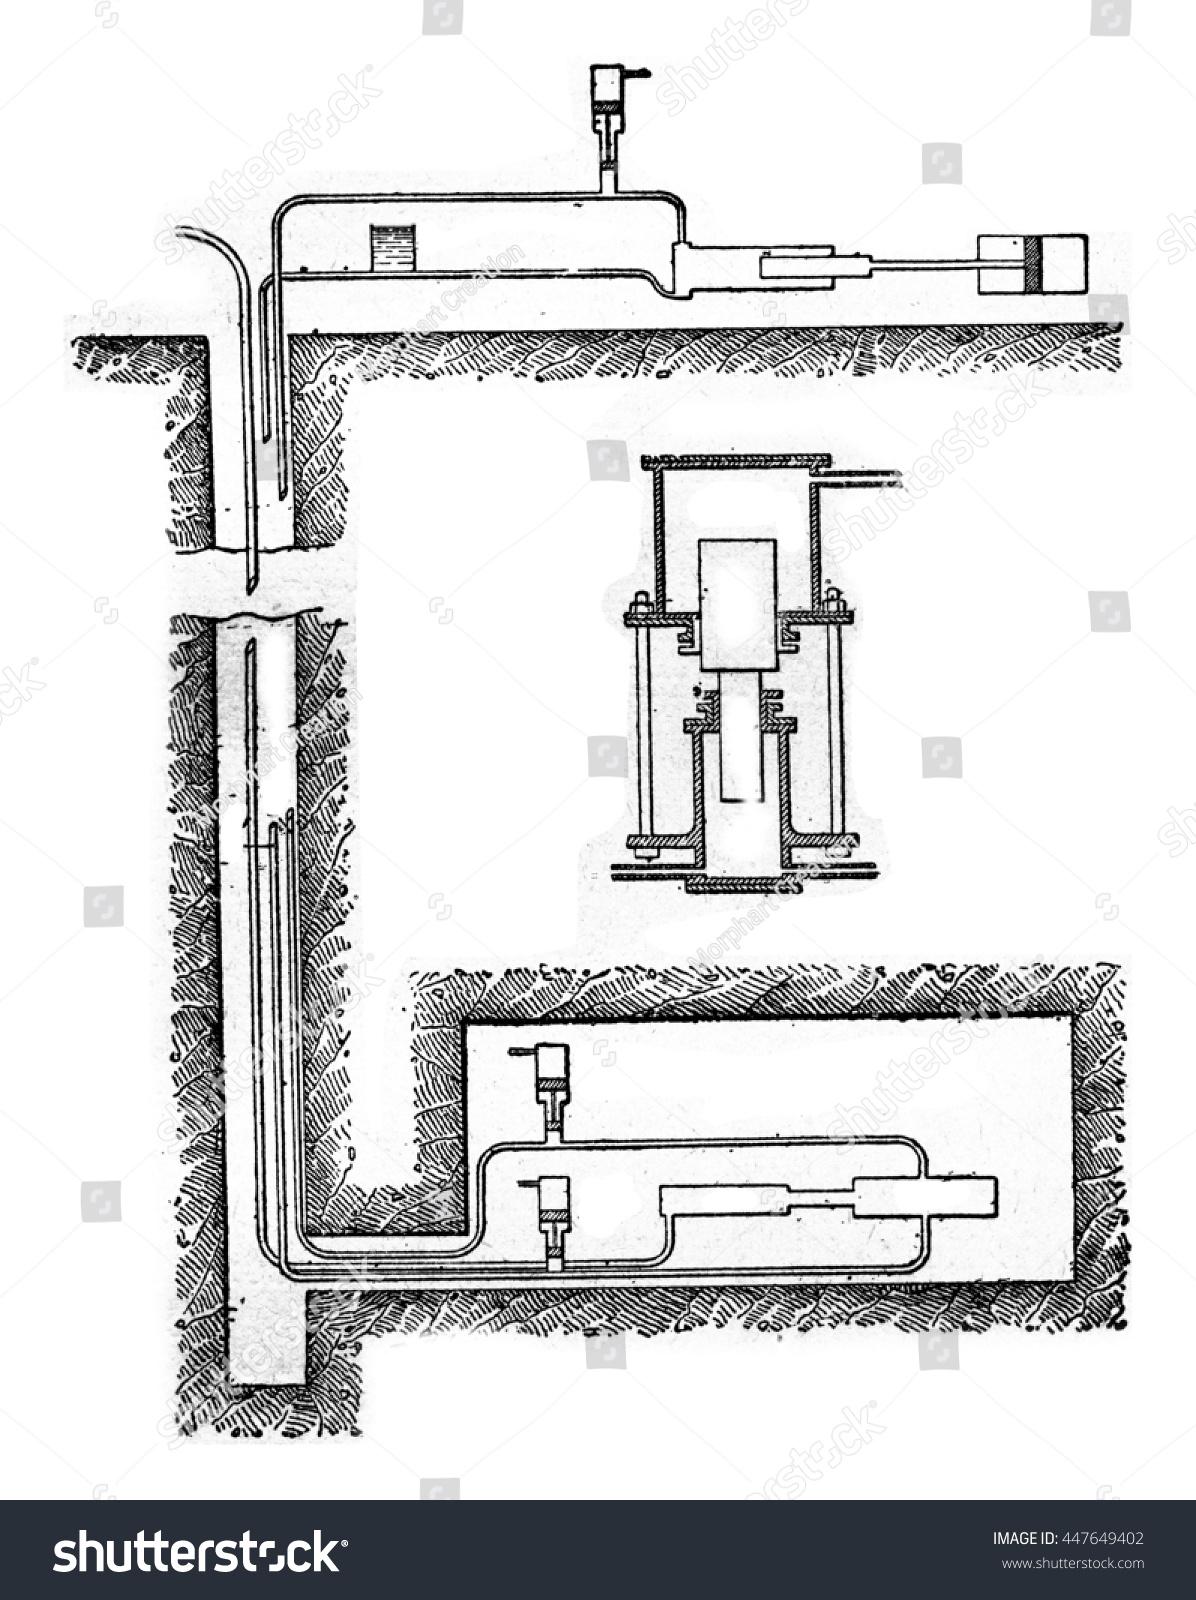 hight resolution of diagram of hydraulic transmission pump vintage engraved illustration industrial encyclopedia e o lami 1875